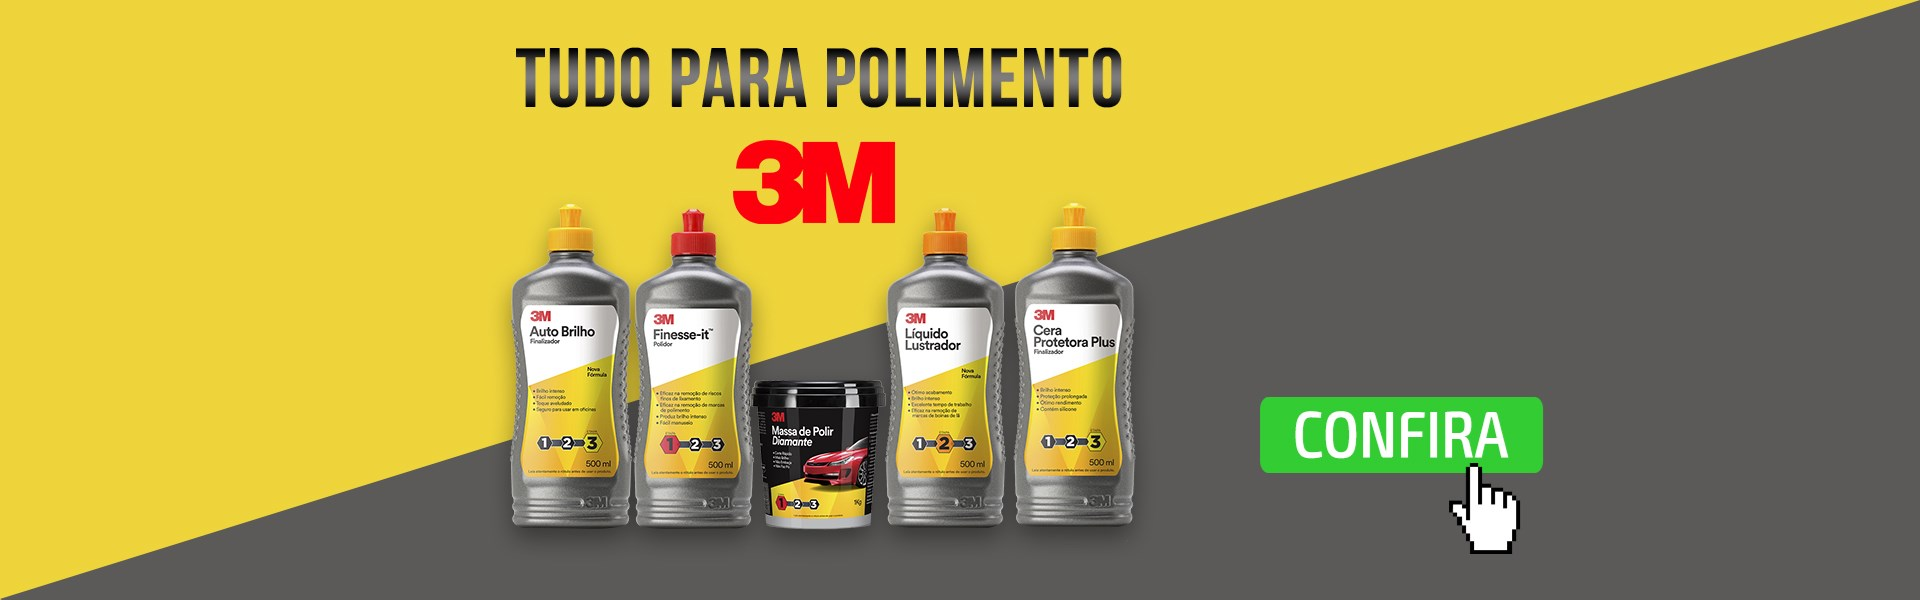 Polimento 3M